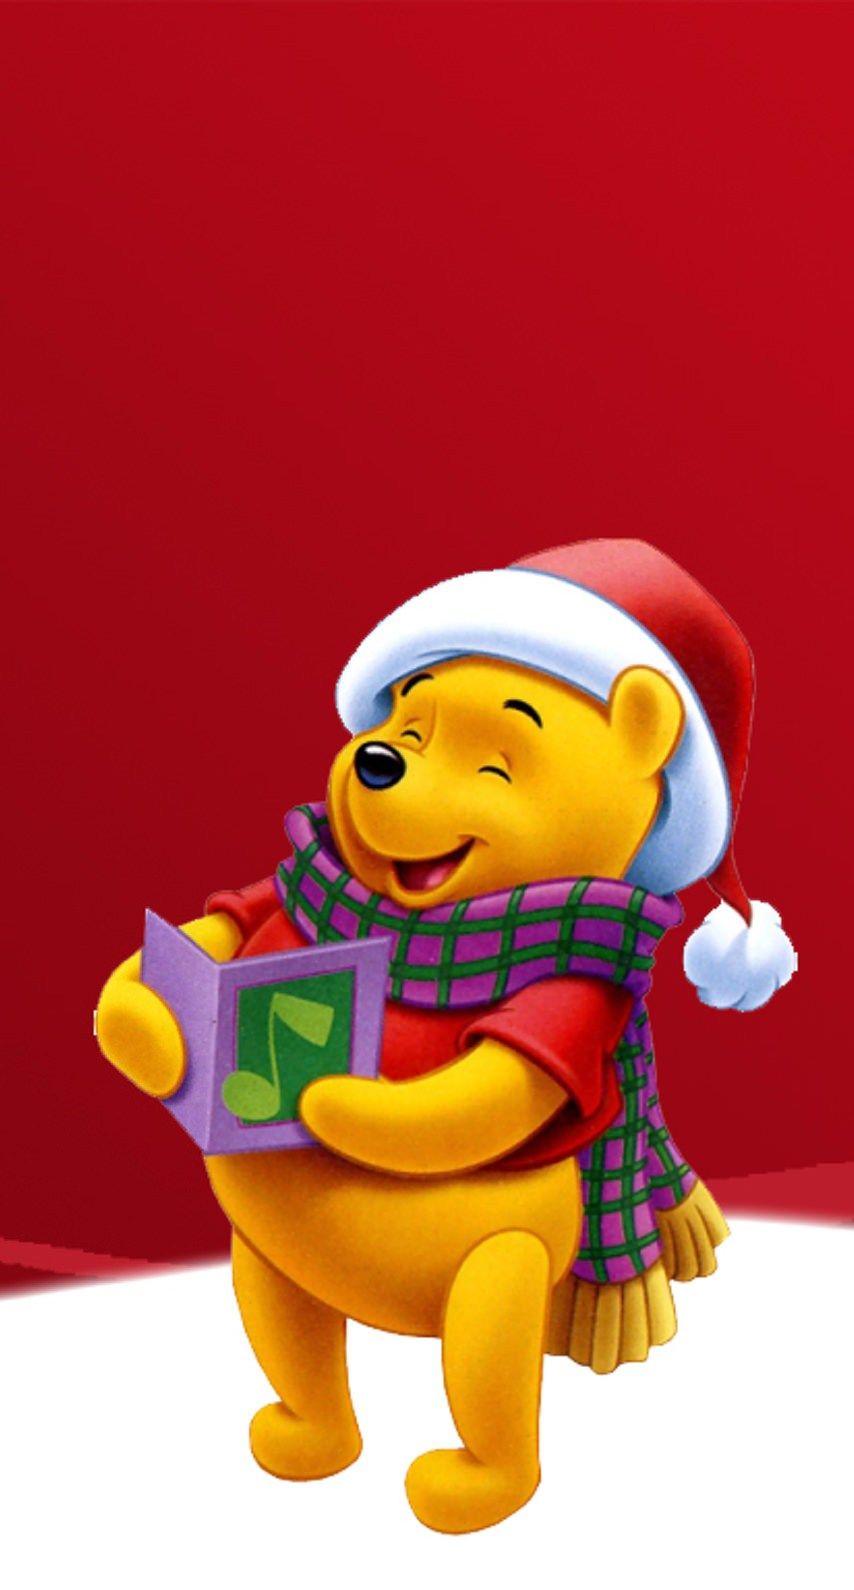 Winnie the Pooh Christmas 漫画の壁紙, くまのプーさん, プーさん 壁紙